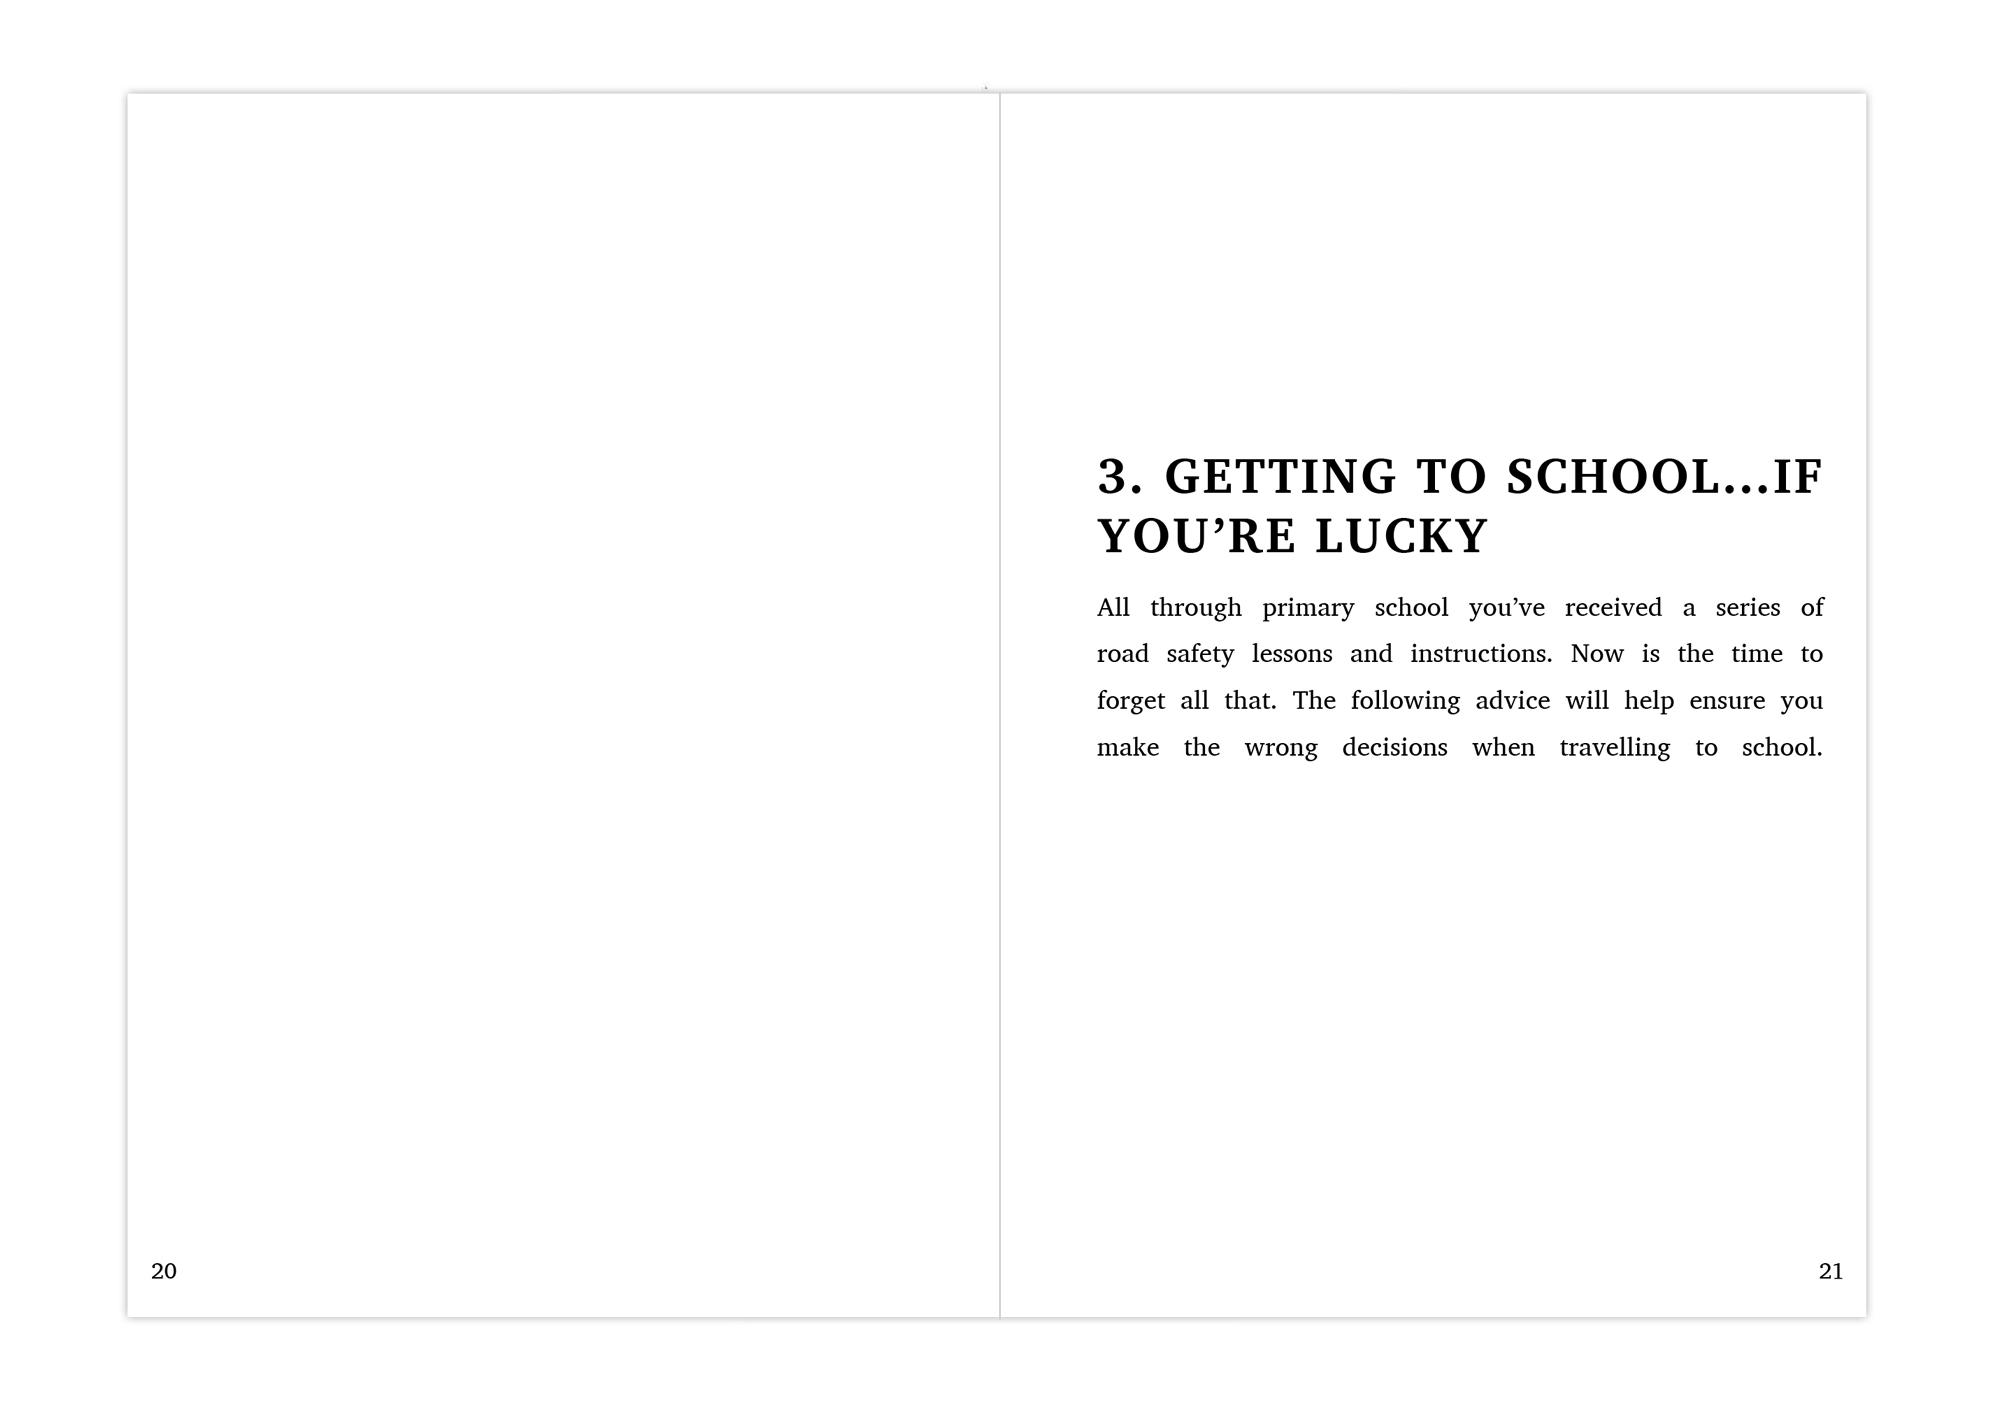 DG-spread-getting to school.jpg